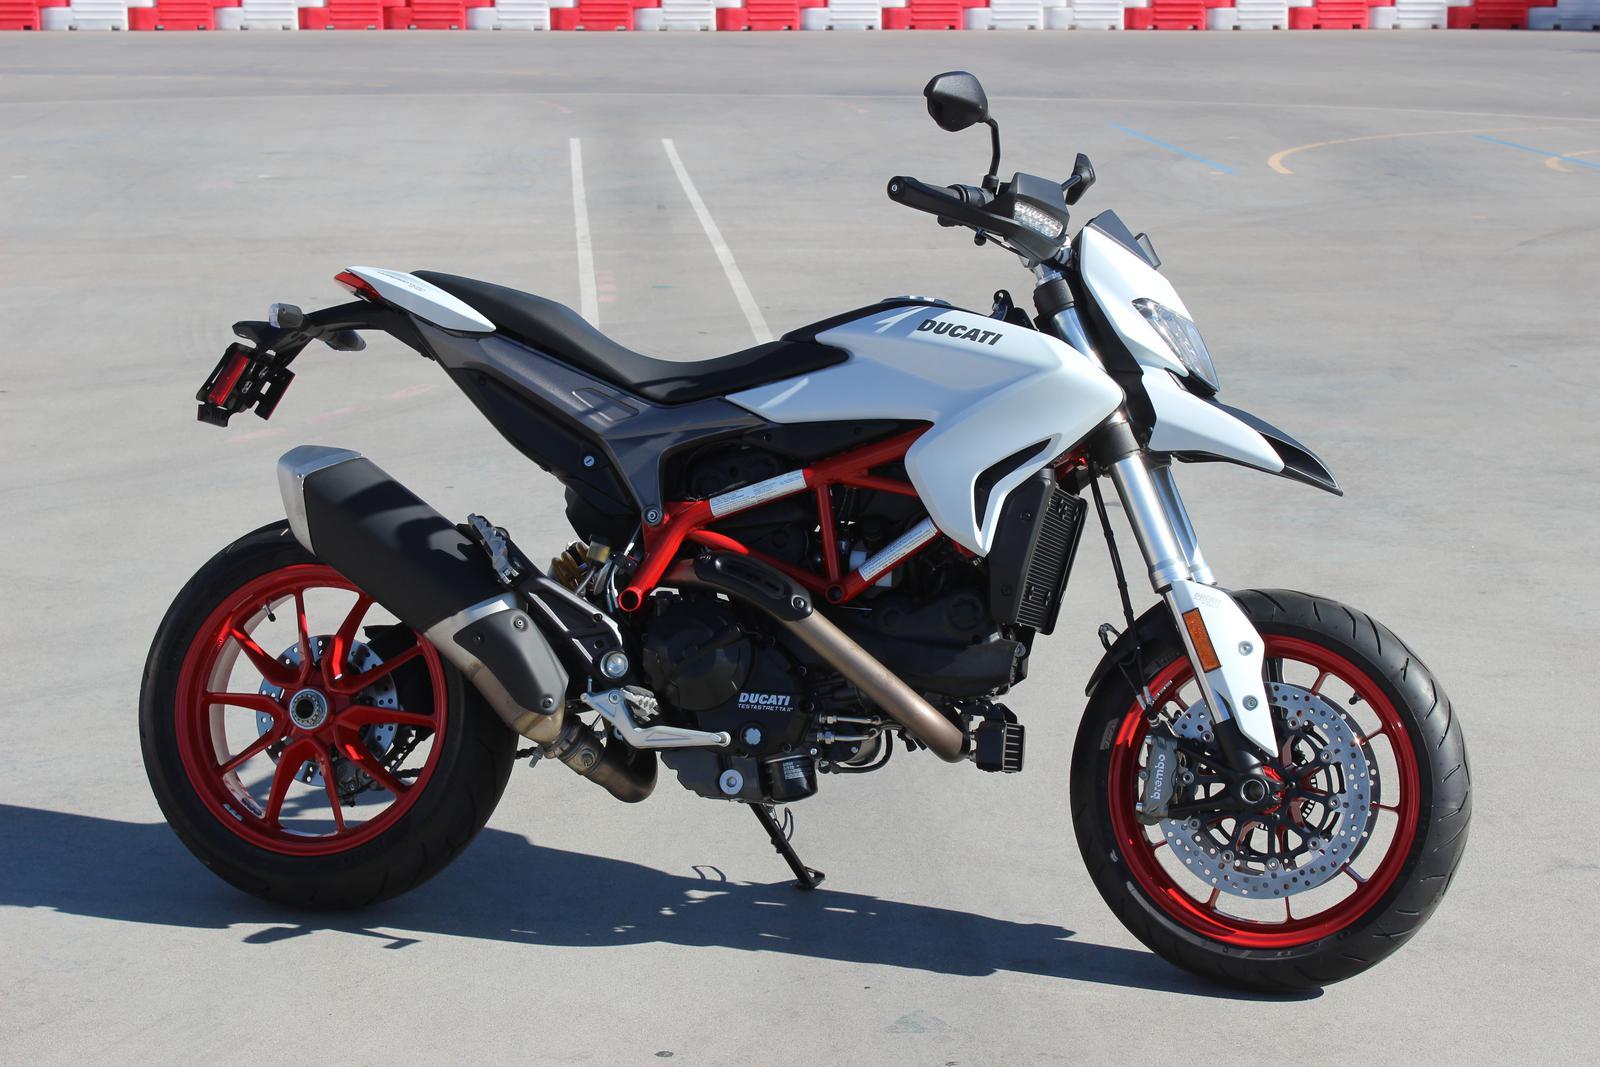 2018 Ducati Hypermotard 939 - Star White Silk for sale in Scottsdale ...